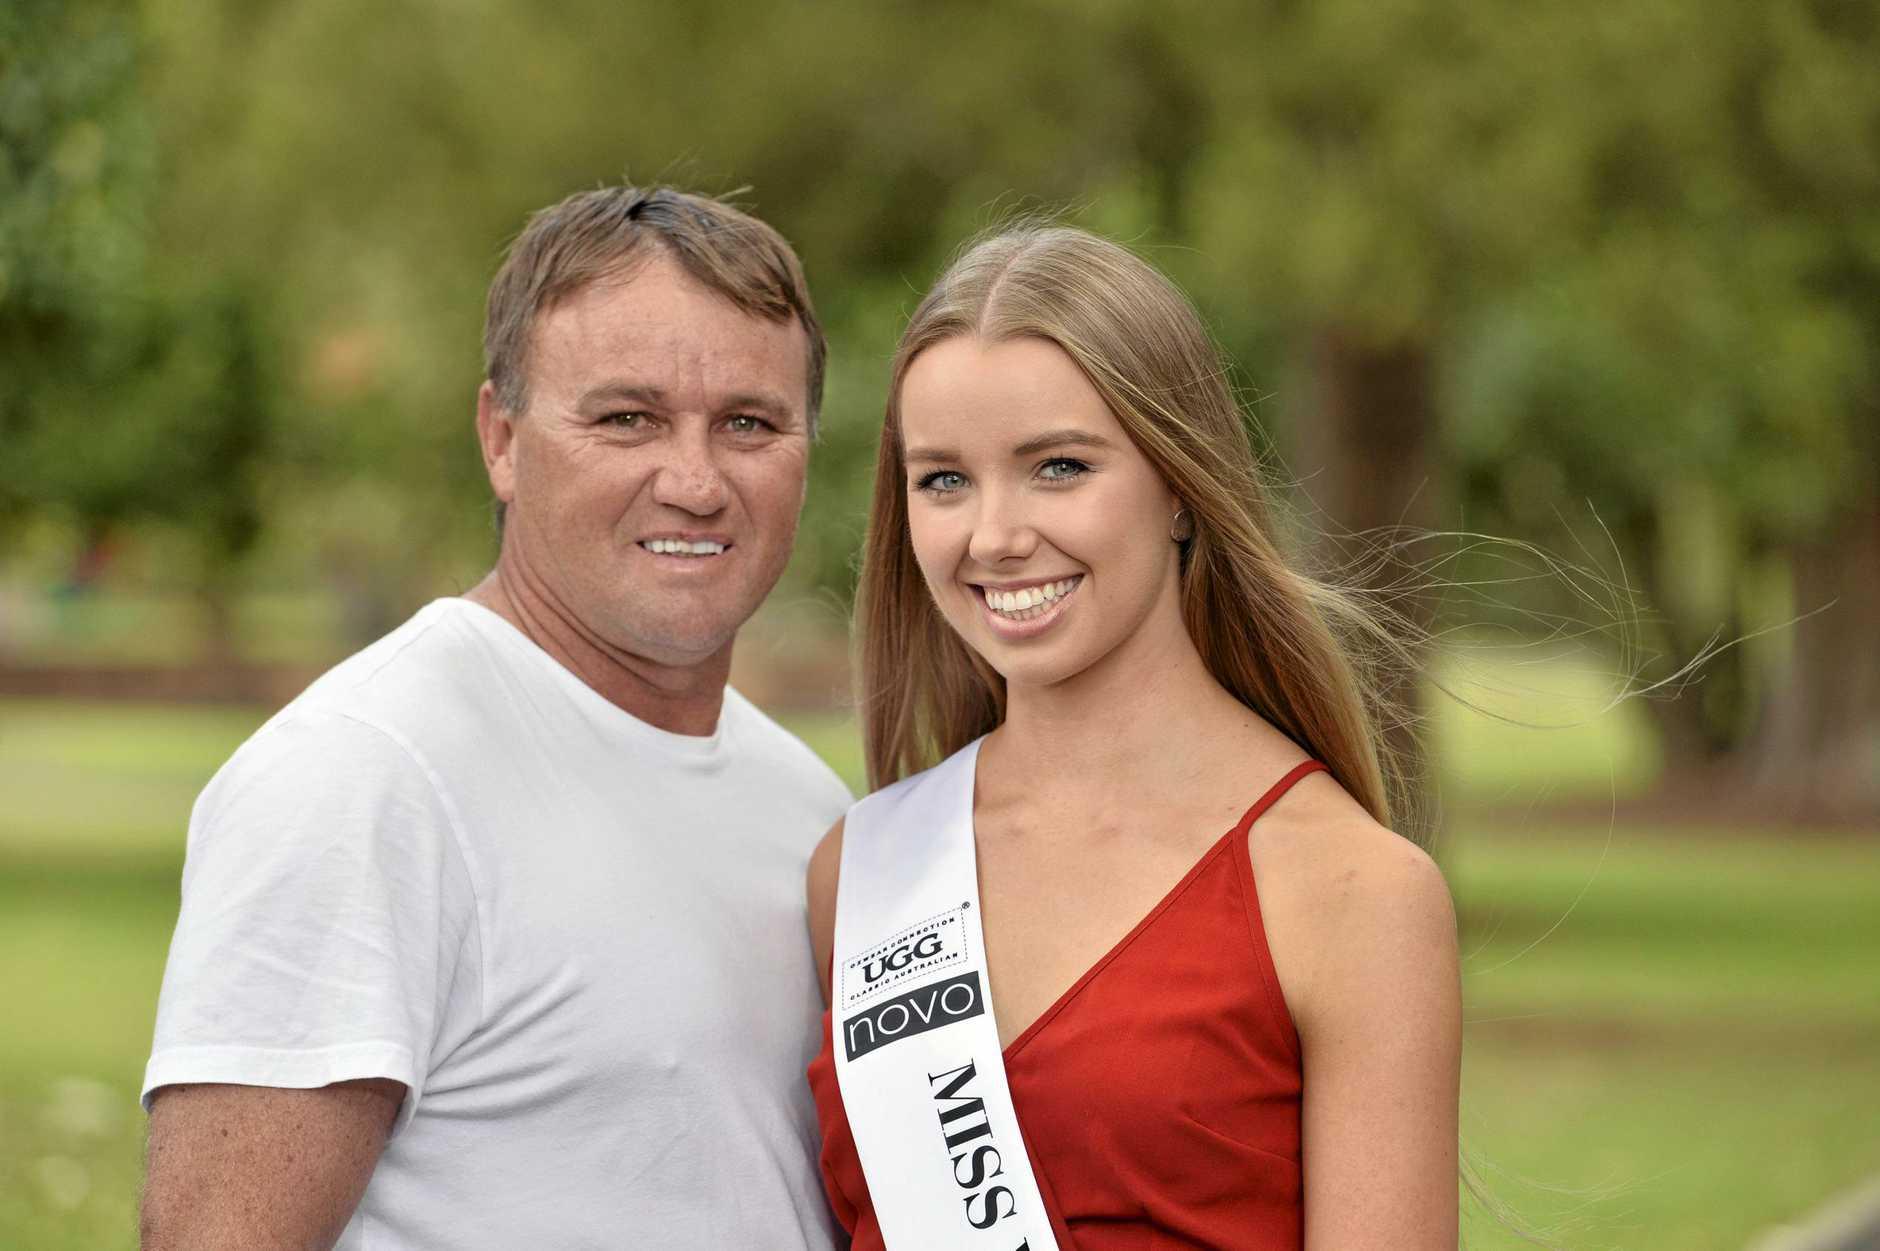 Proud dad Shane Cherry with his daughter Miss World Australia Queensland finalist Mia Cherry, Saturday, June 29, 2019.